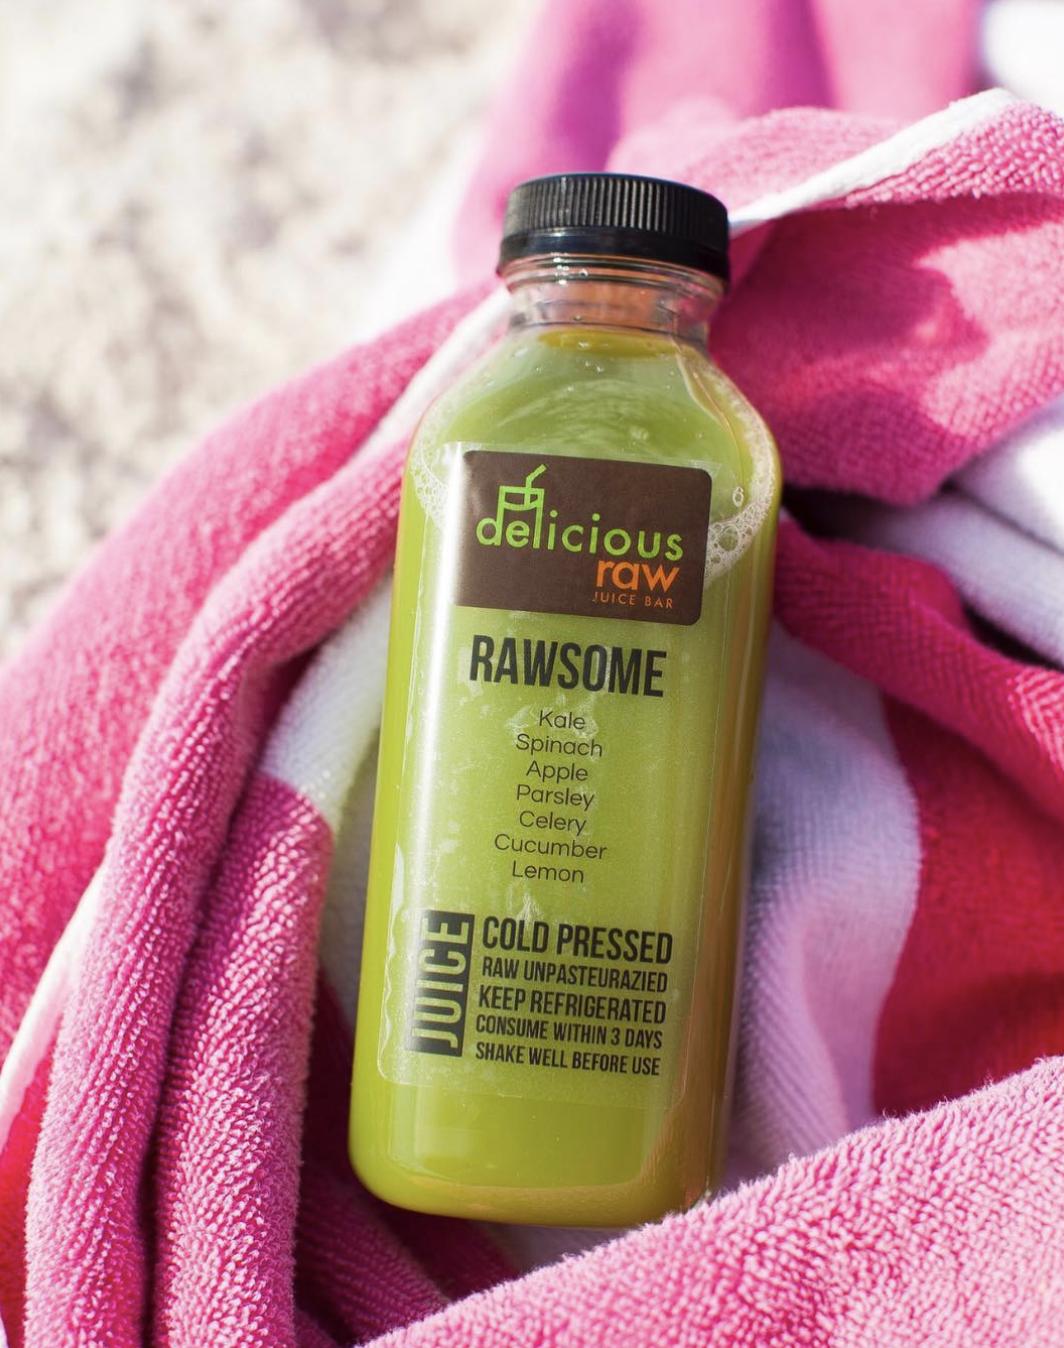 Delicious Raw sunset harbour juice miami